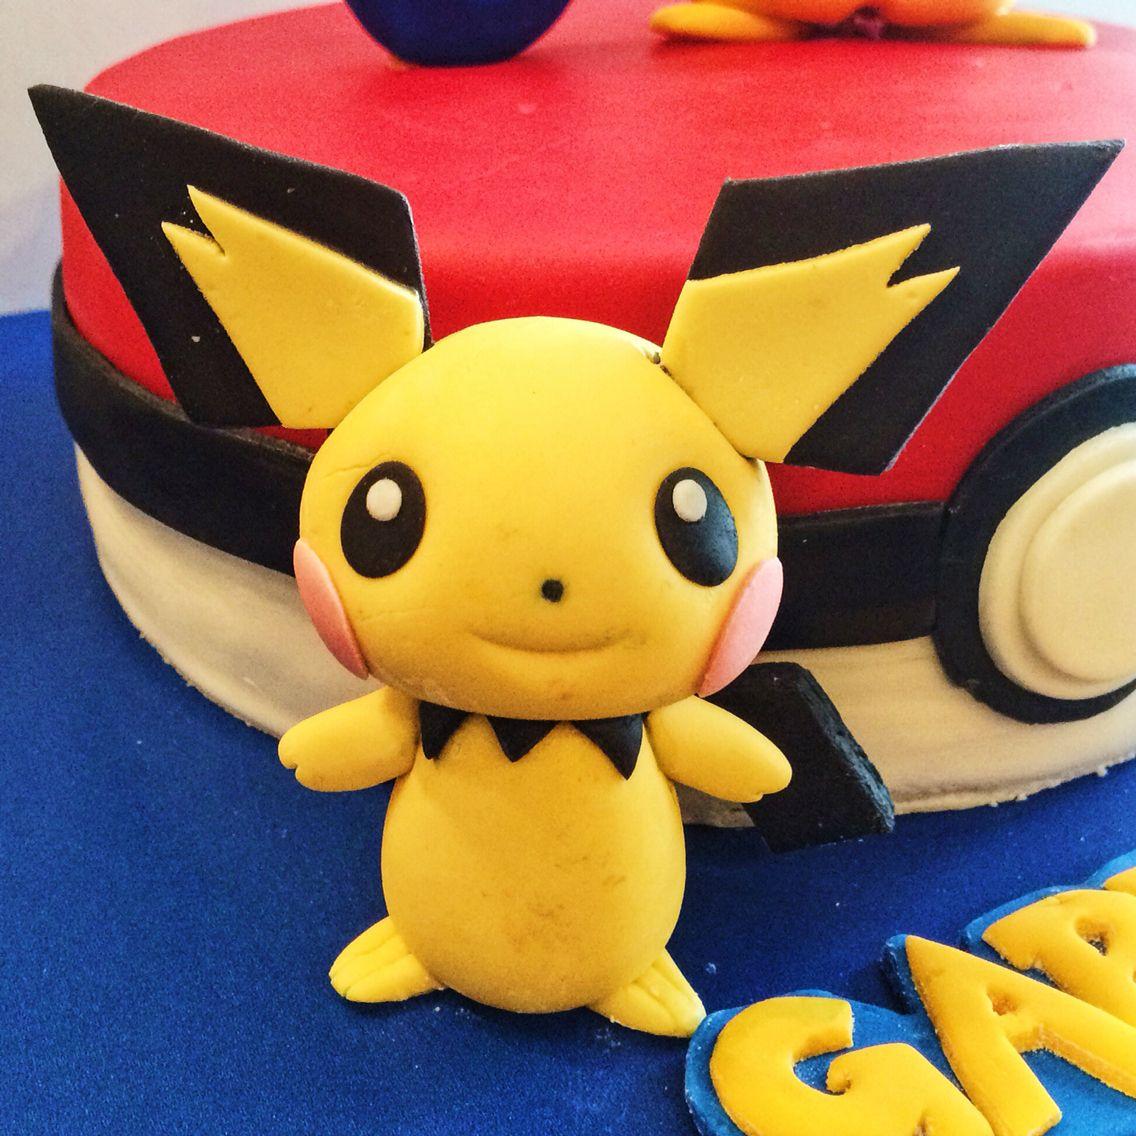 Cute fondant Pichu figure cake topper   Kager   Pinterest   Kage